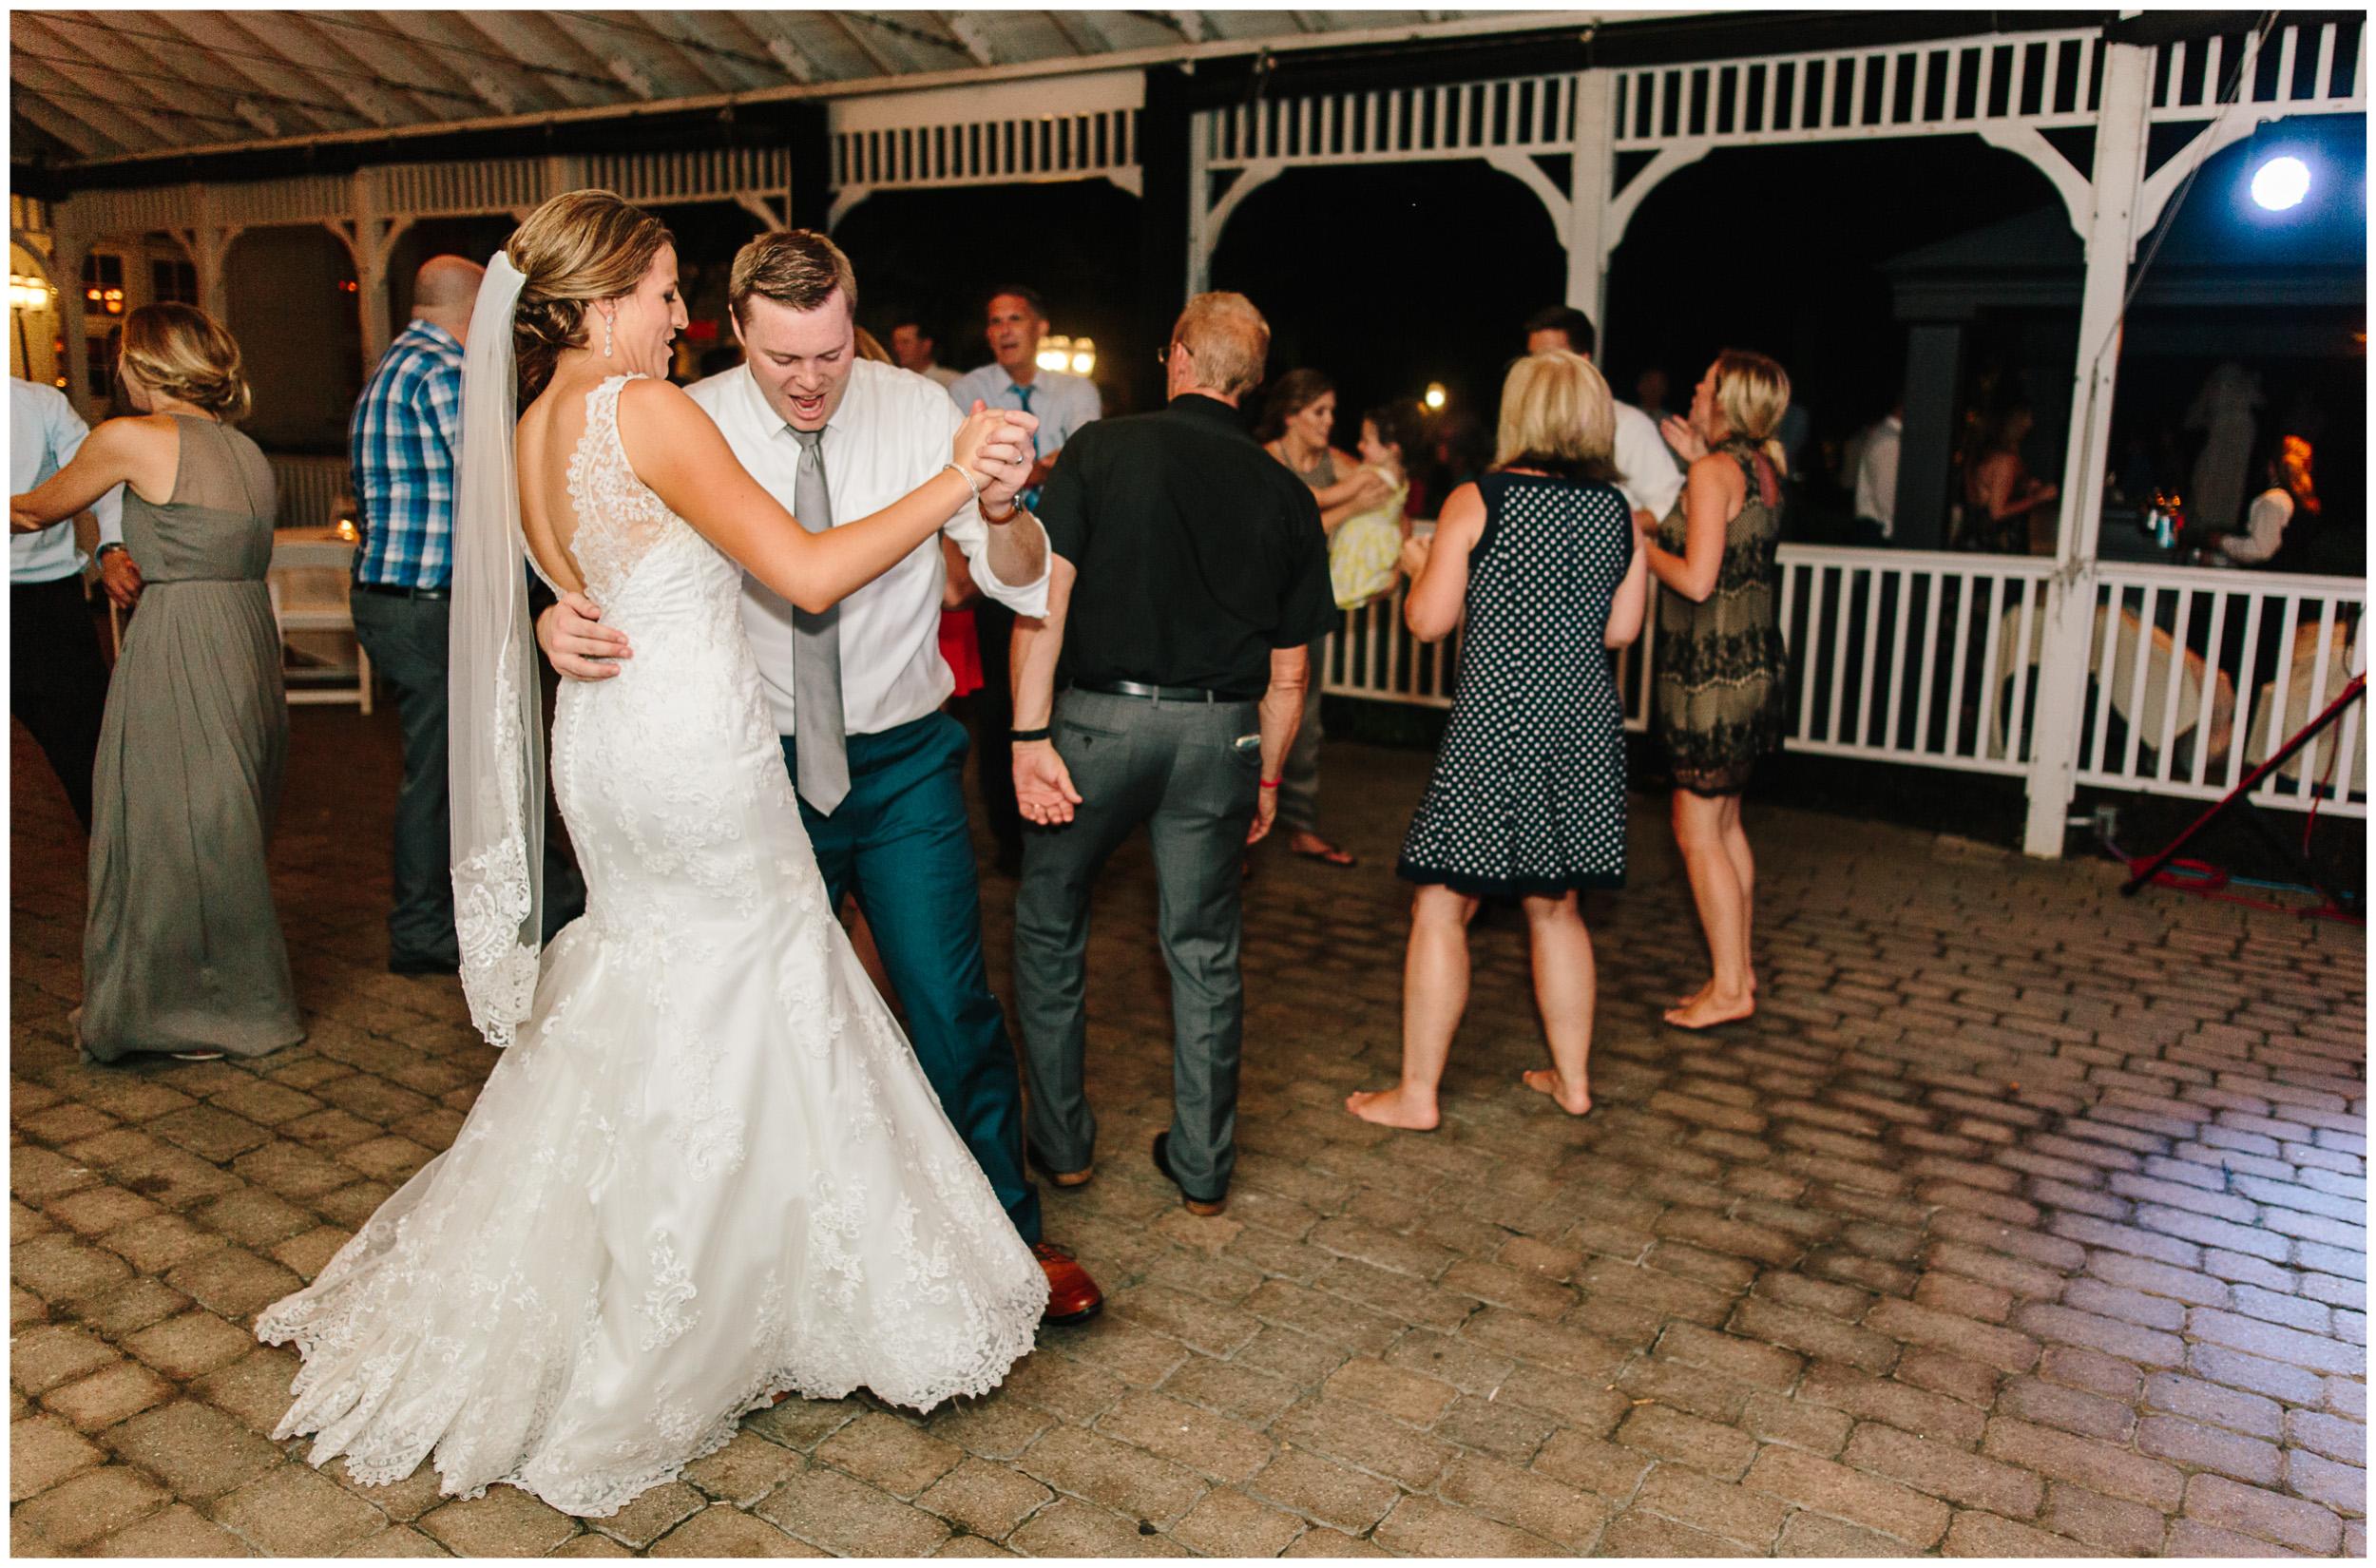 ann_arbor_michigan_wedding_104.jpg